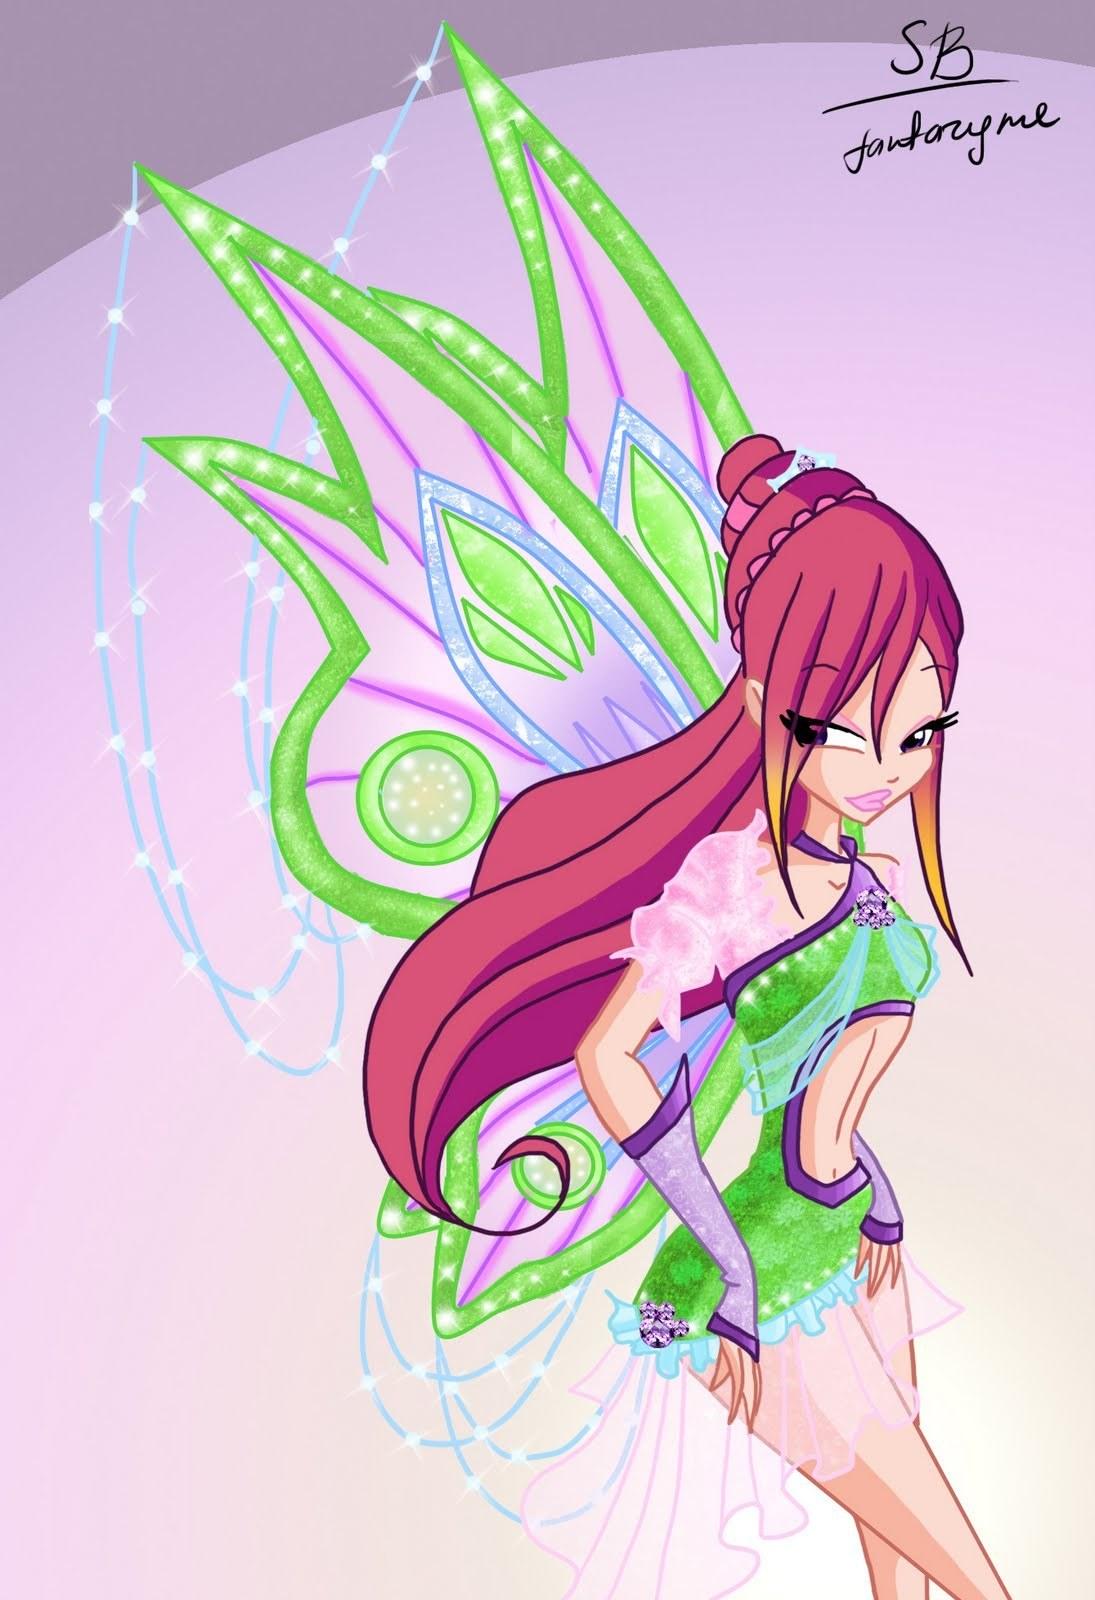 http://images2.fanpop.com/image/photos/11400000/roxy-sparklix-the-winx-club-11482439-1095-1600.jpg